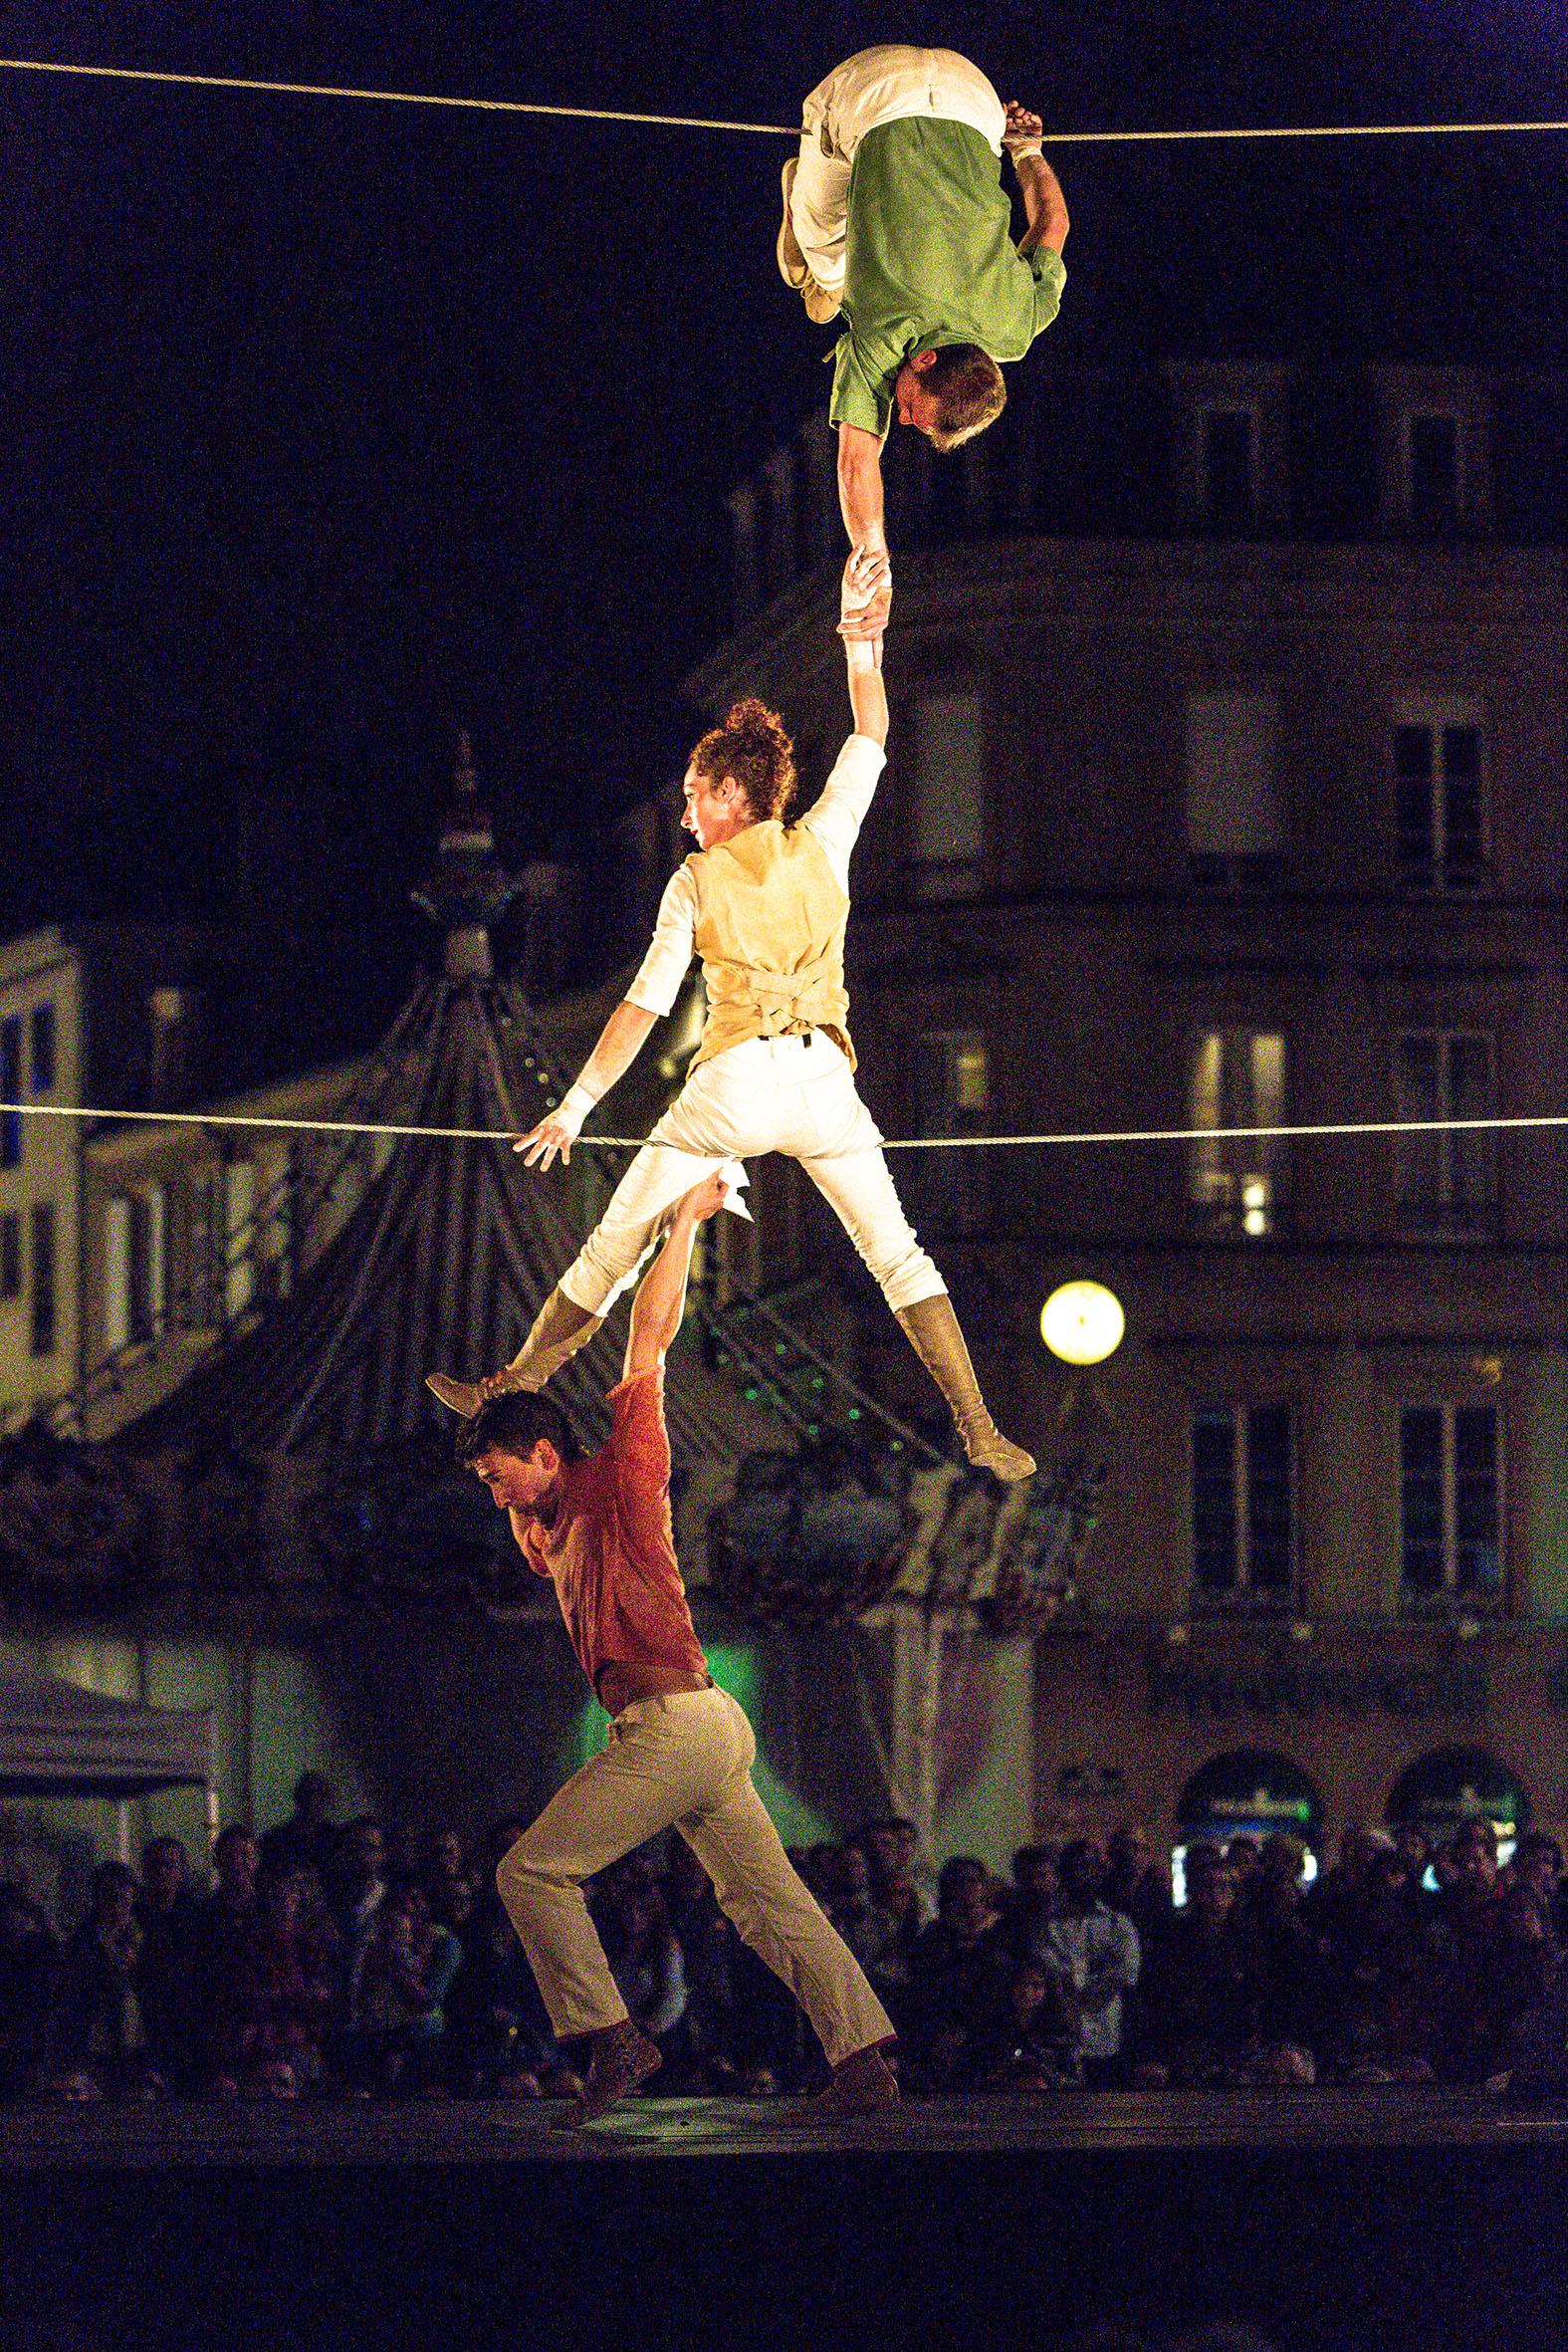 spectacles-sodade-cirque-rouage-mirabelle-metz-2015-marie-colette-becker-12